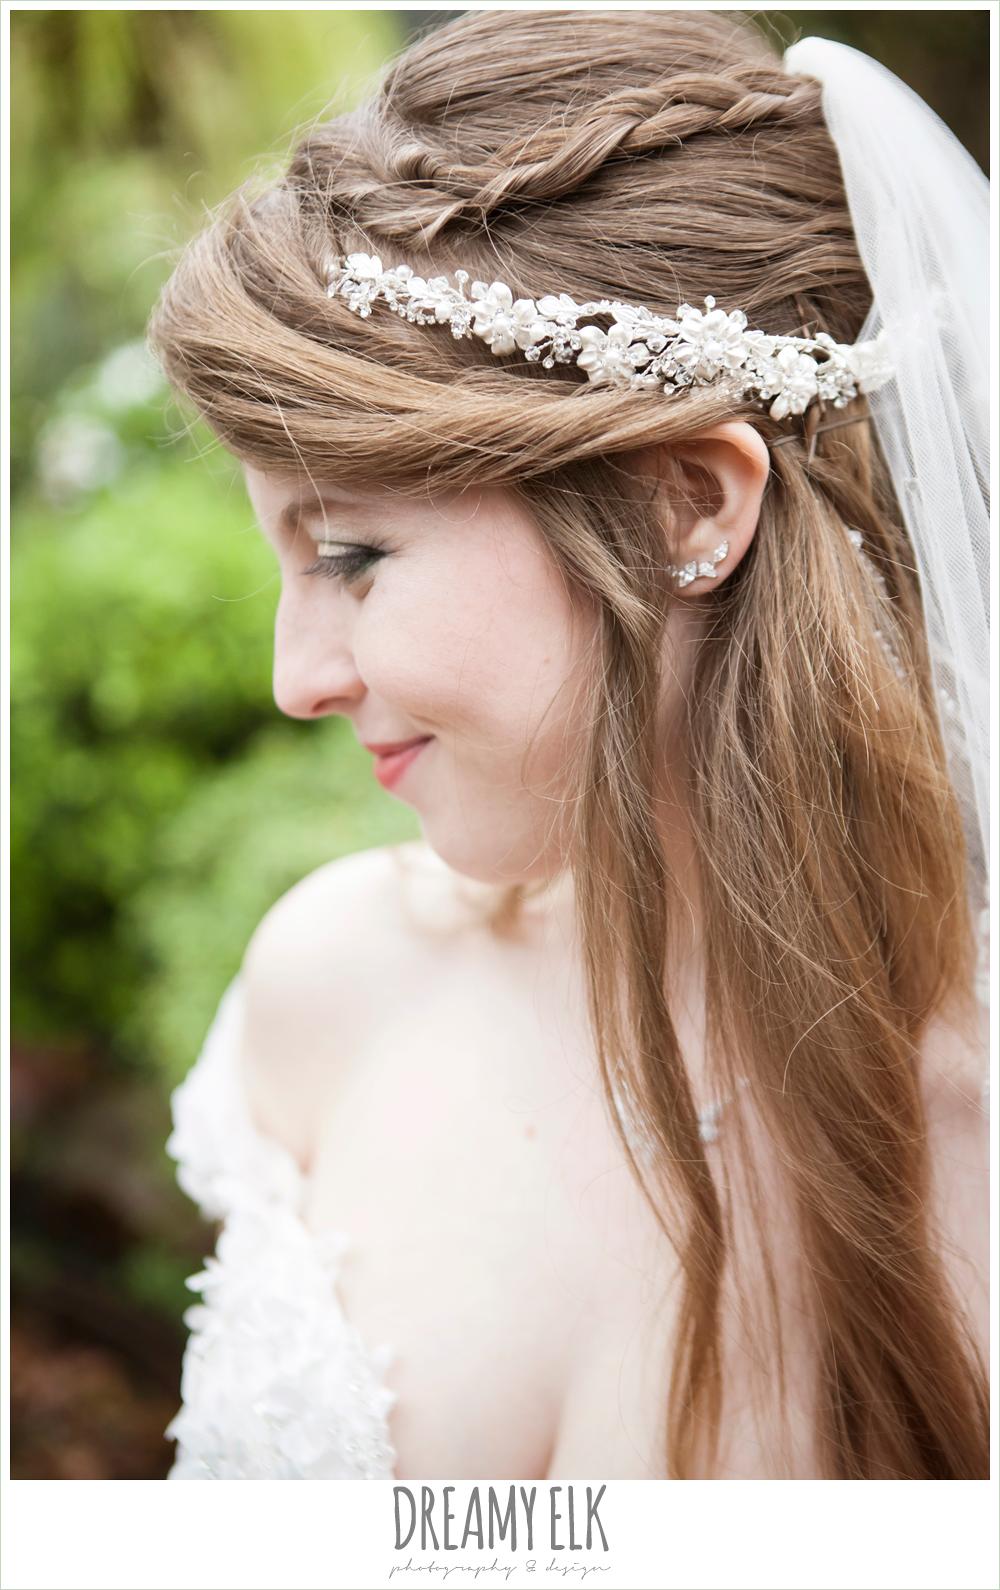 unique wedding hair down, off the shoulder wedding dress, le jardin winter wedding {dreamy elk photography and design}